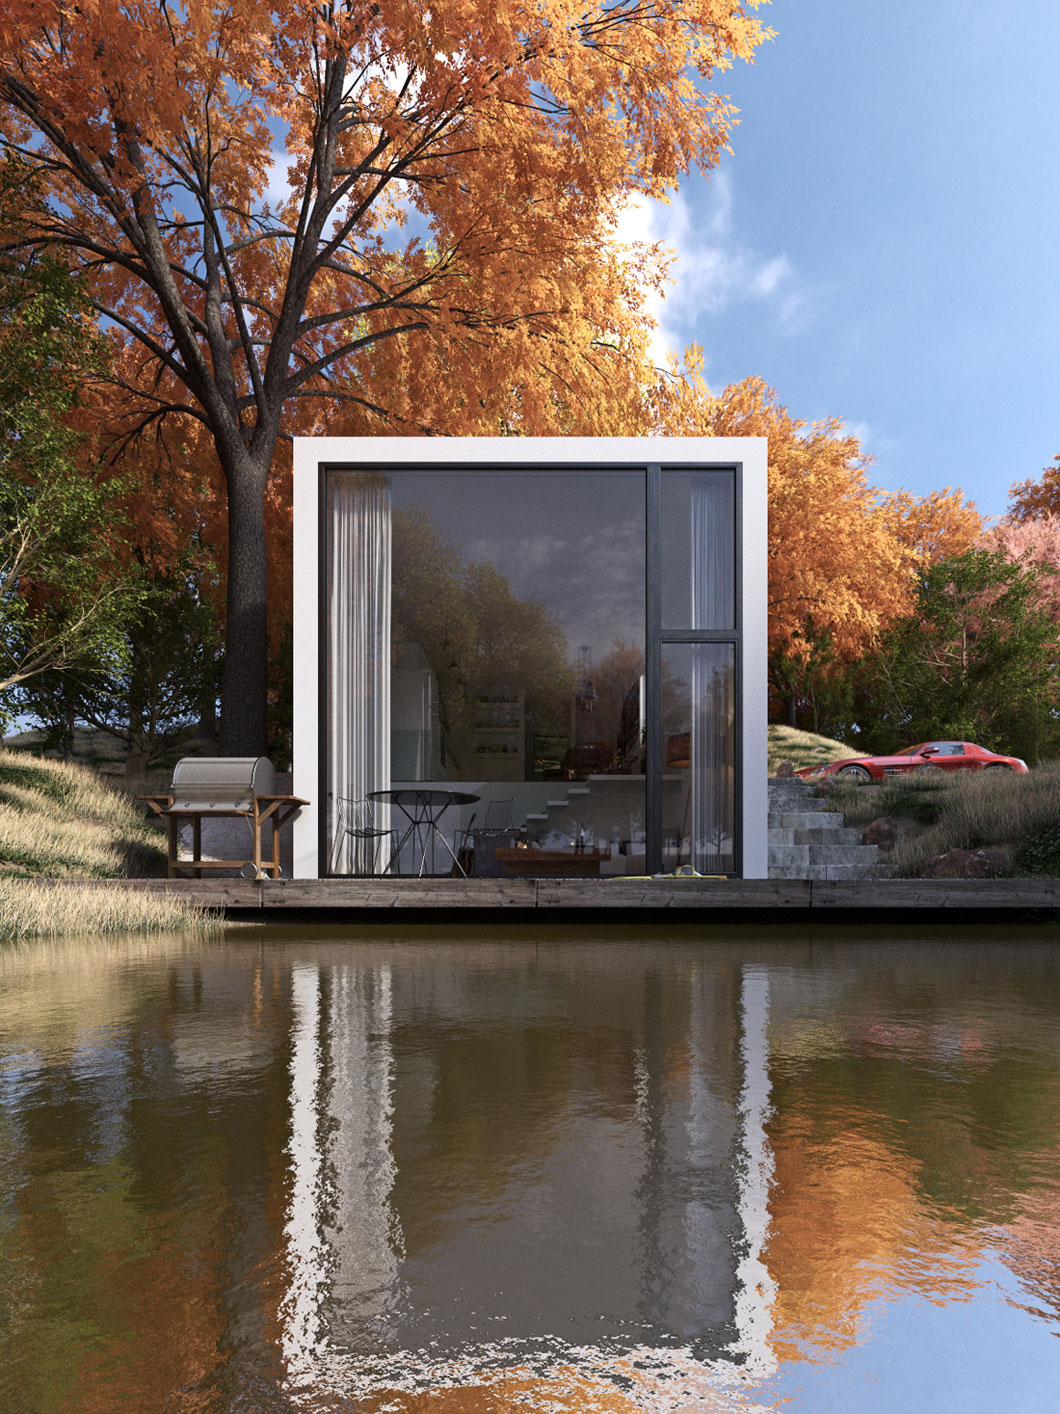 Lake House by Paulo Quartilho (1)